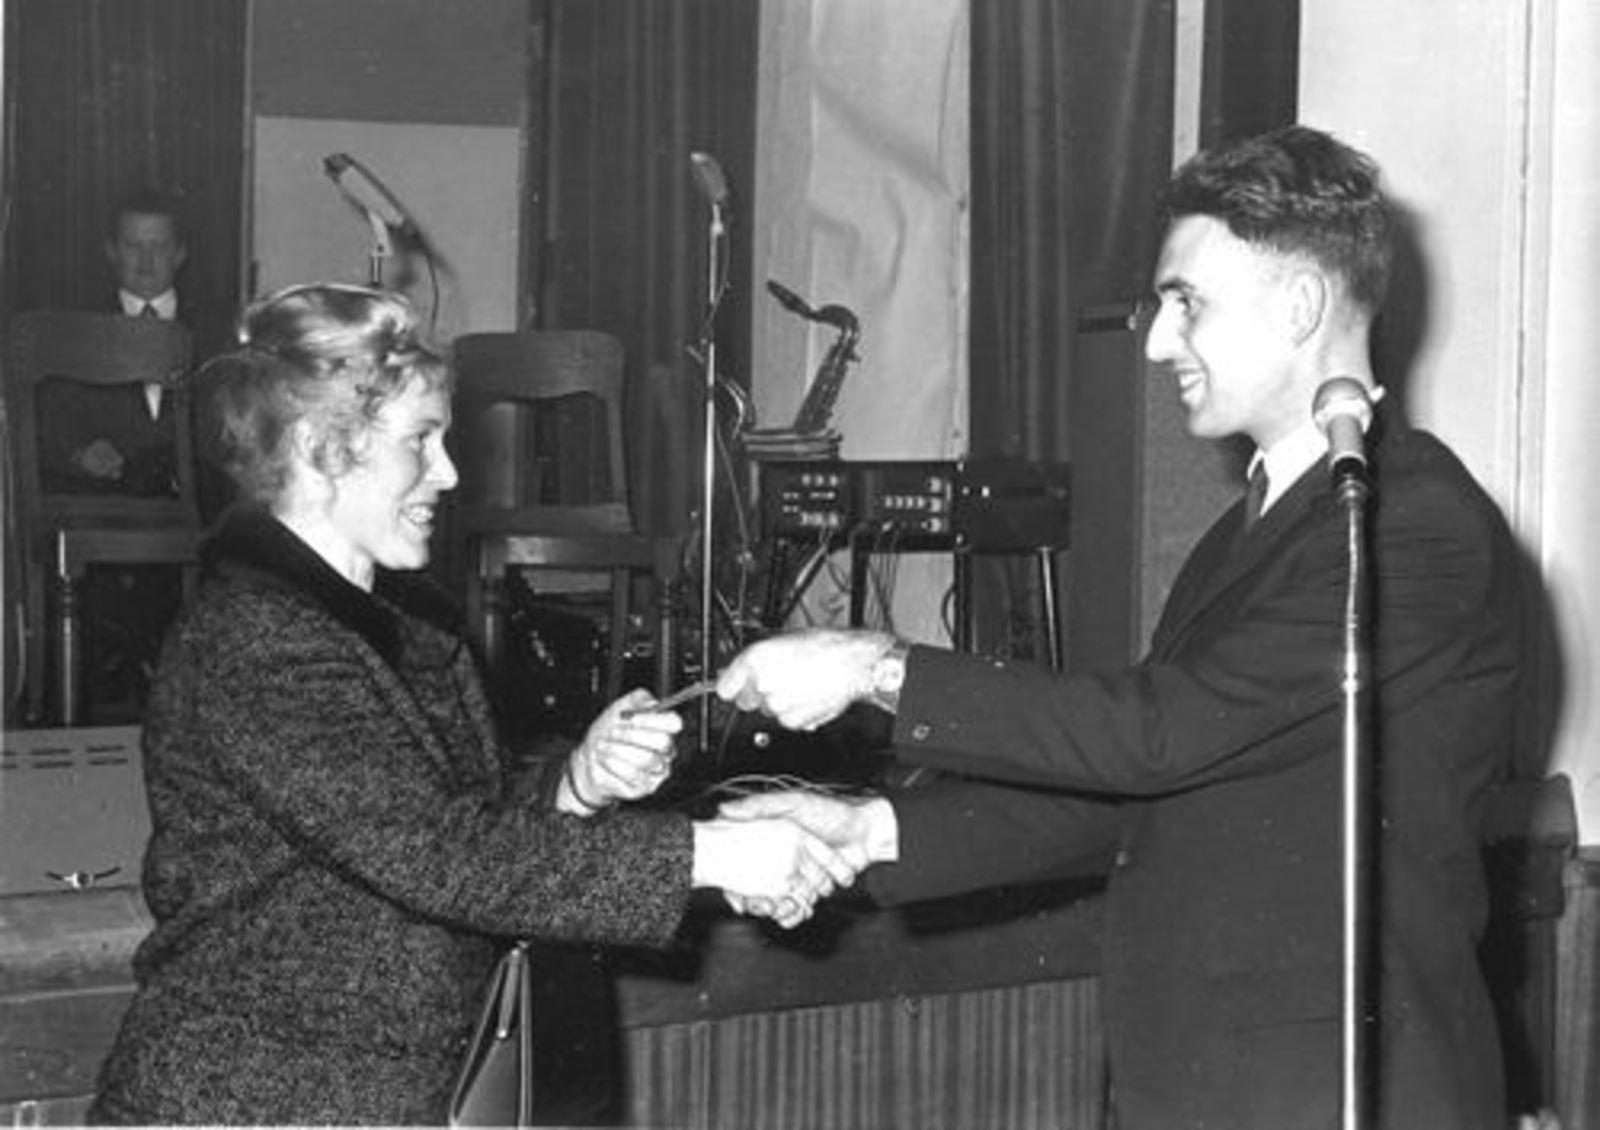 Winkeliersvereniging Hoofddorp 1969-70± Sinterklaas aktie 34